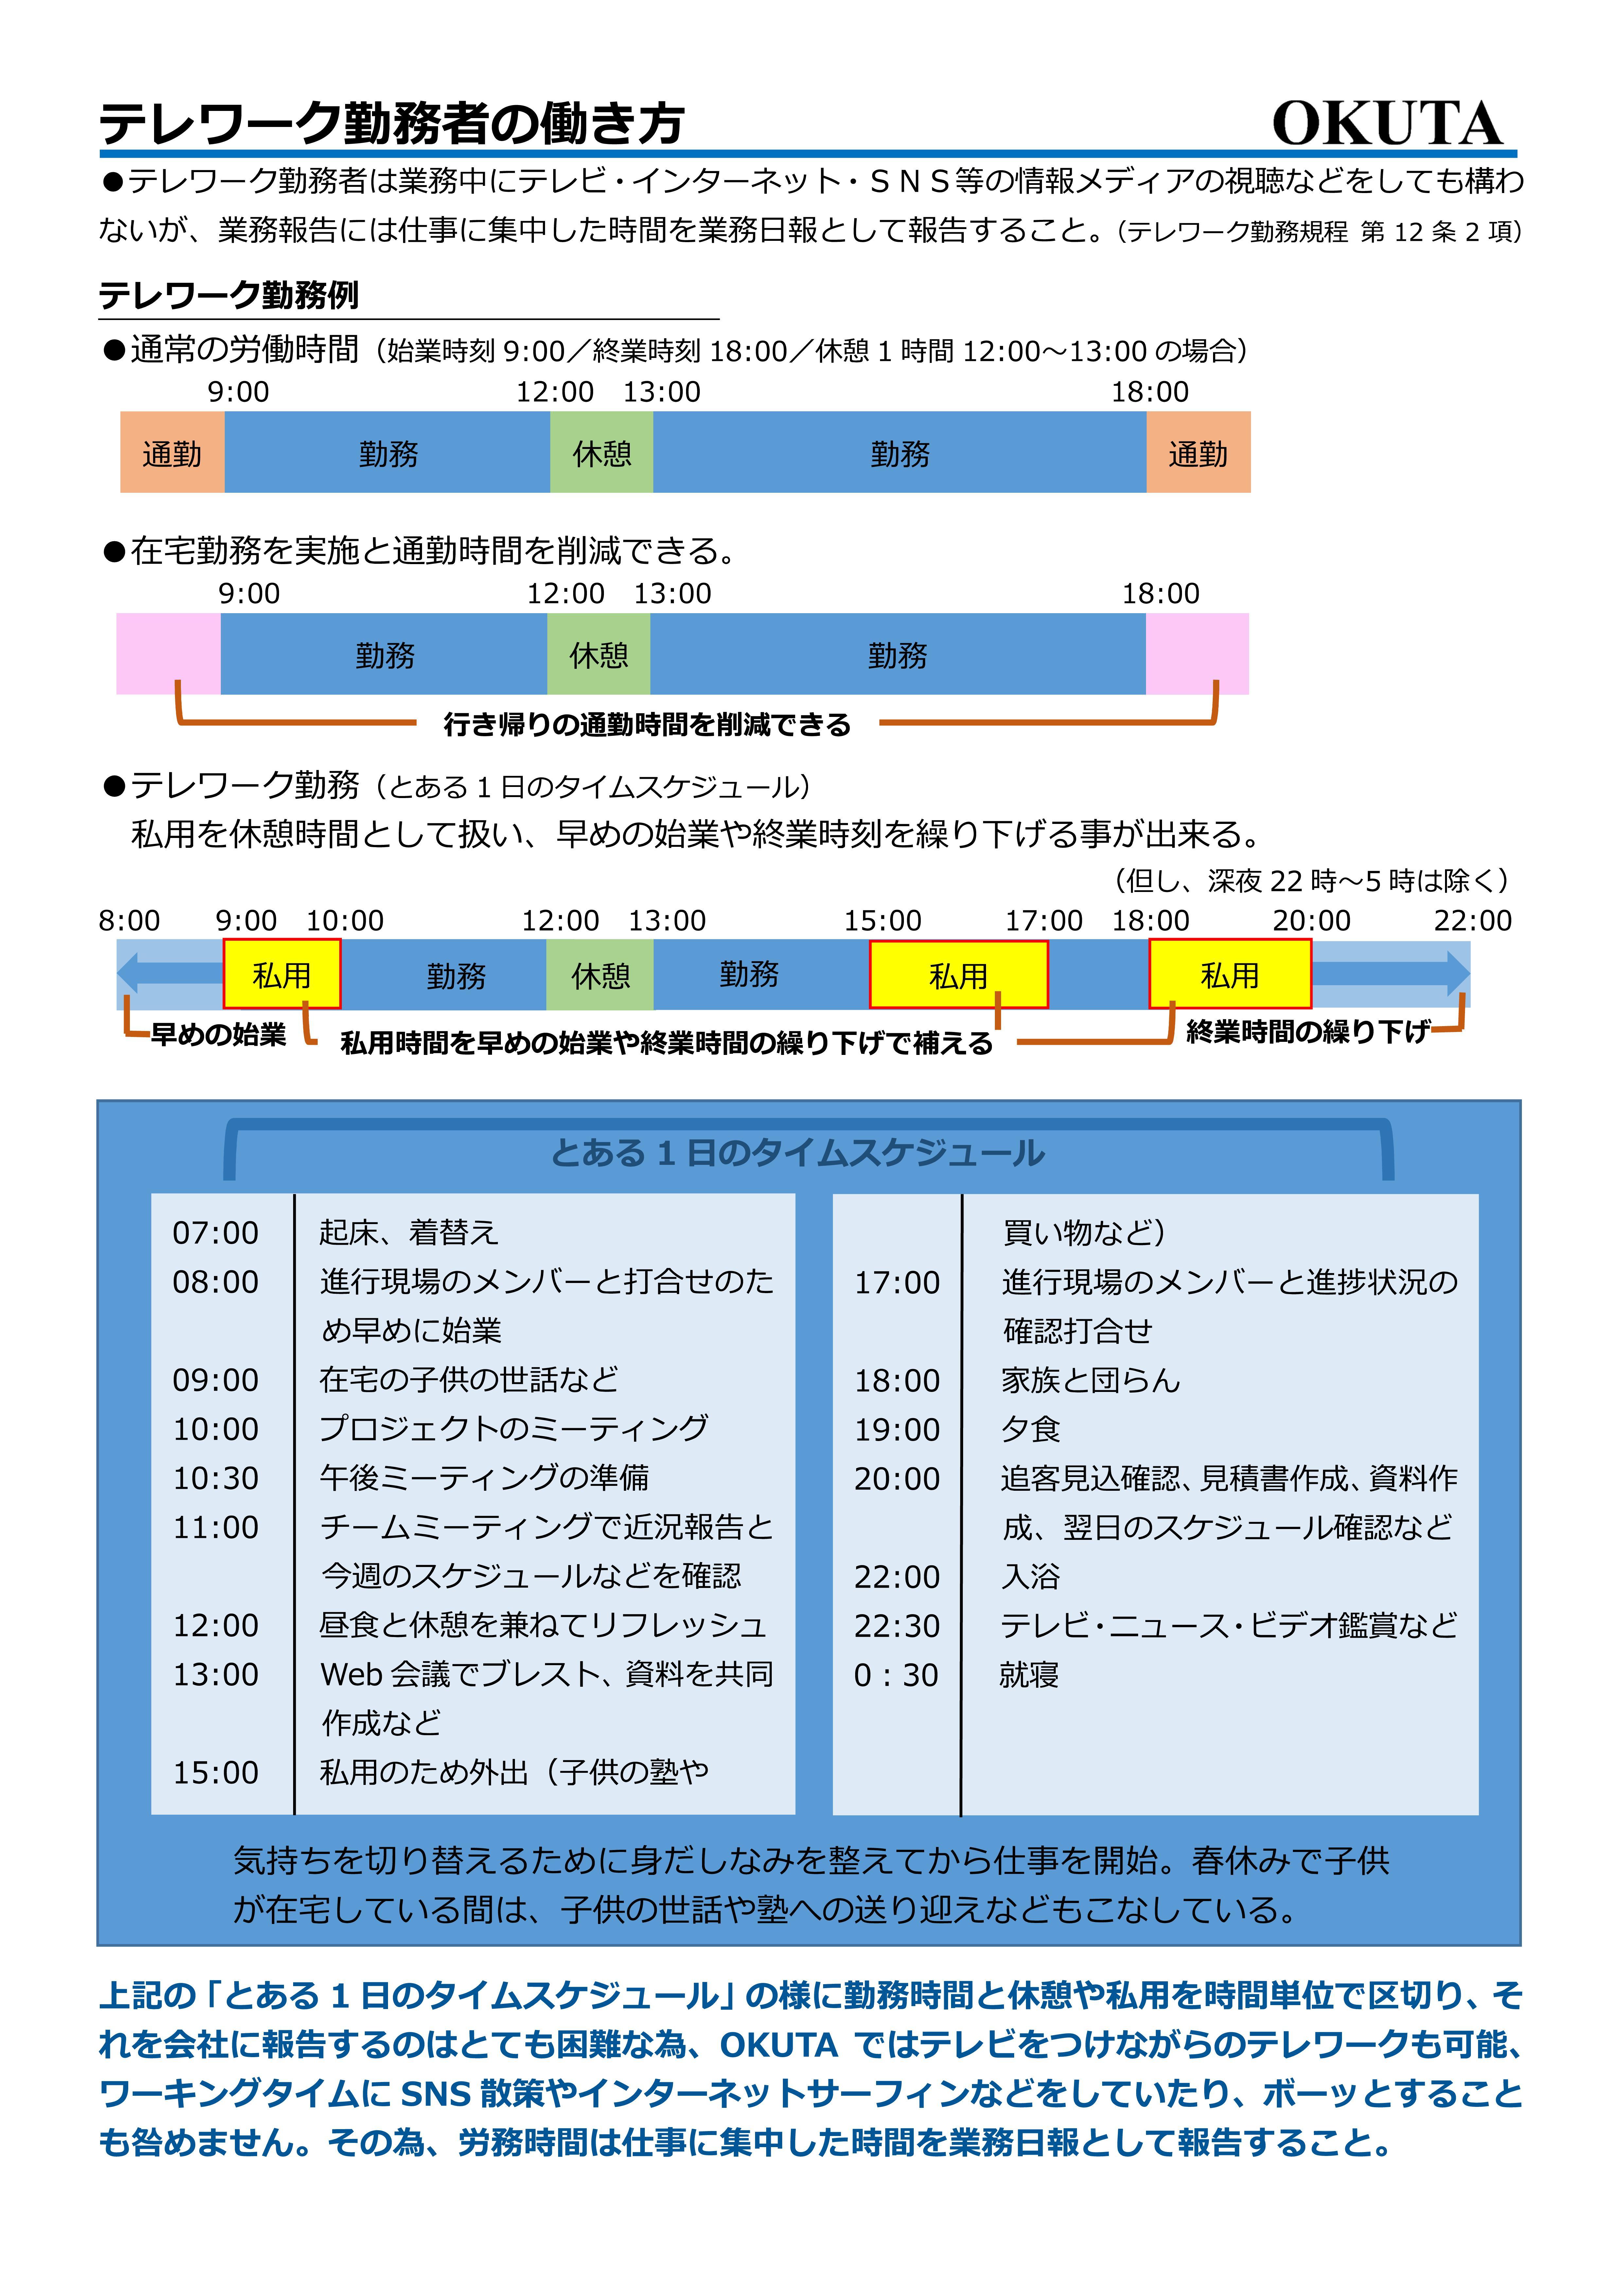 %e3%83%86%e3%83%ac%e3%83%af%e3%83%bc%e3%82%af%e3%82%ac%e3%82%a4%e3%83%89-02